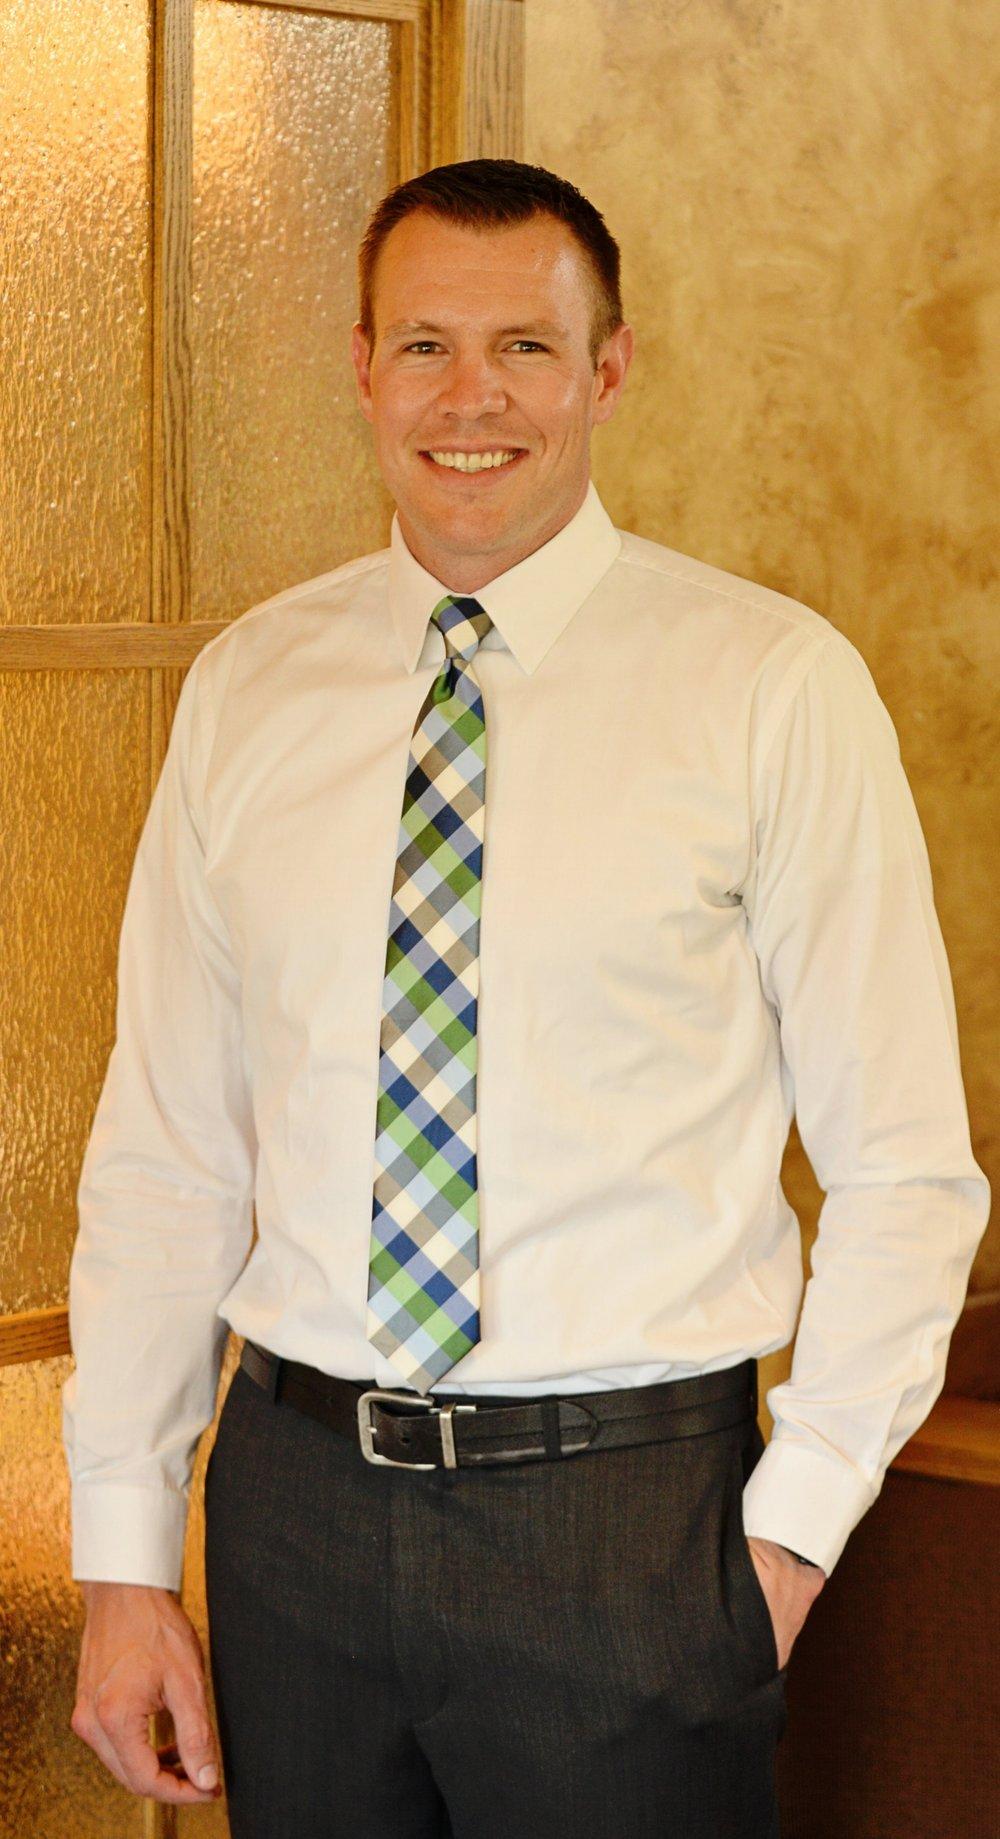 Dr. Mitch J. Driscoll from Pocatello ID